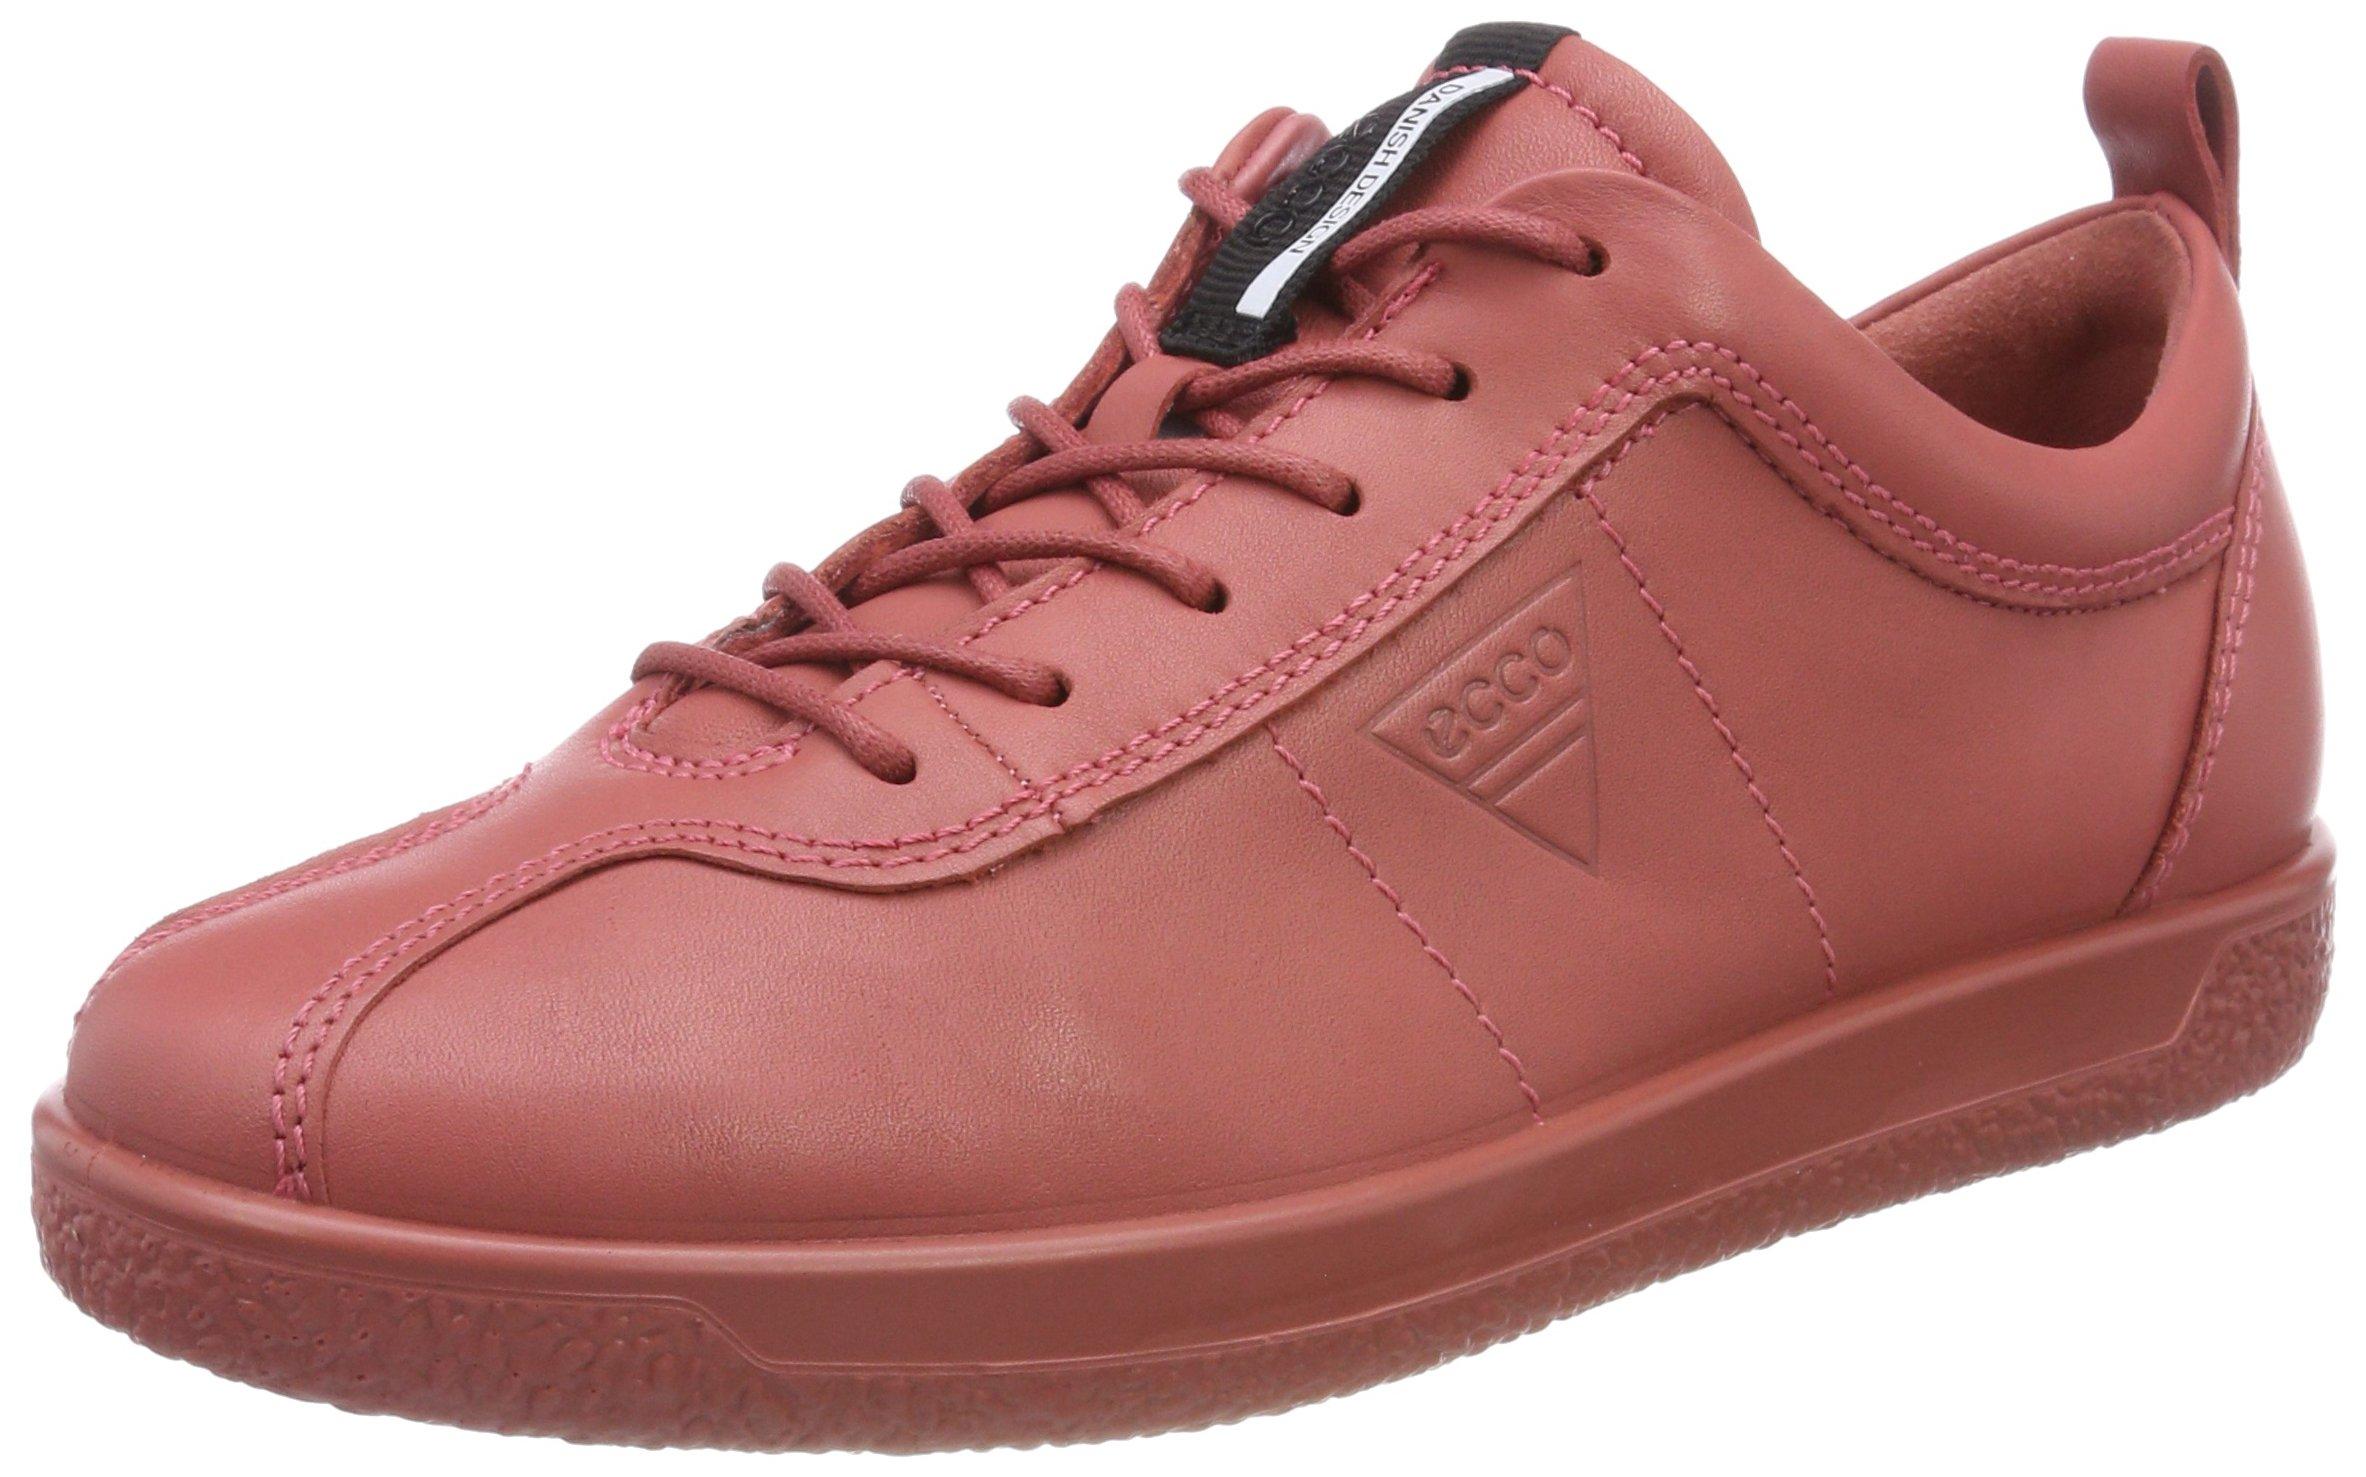 ECCO Msソフト1人の女性のスポーツの靴